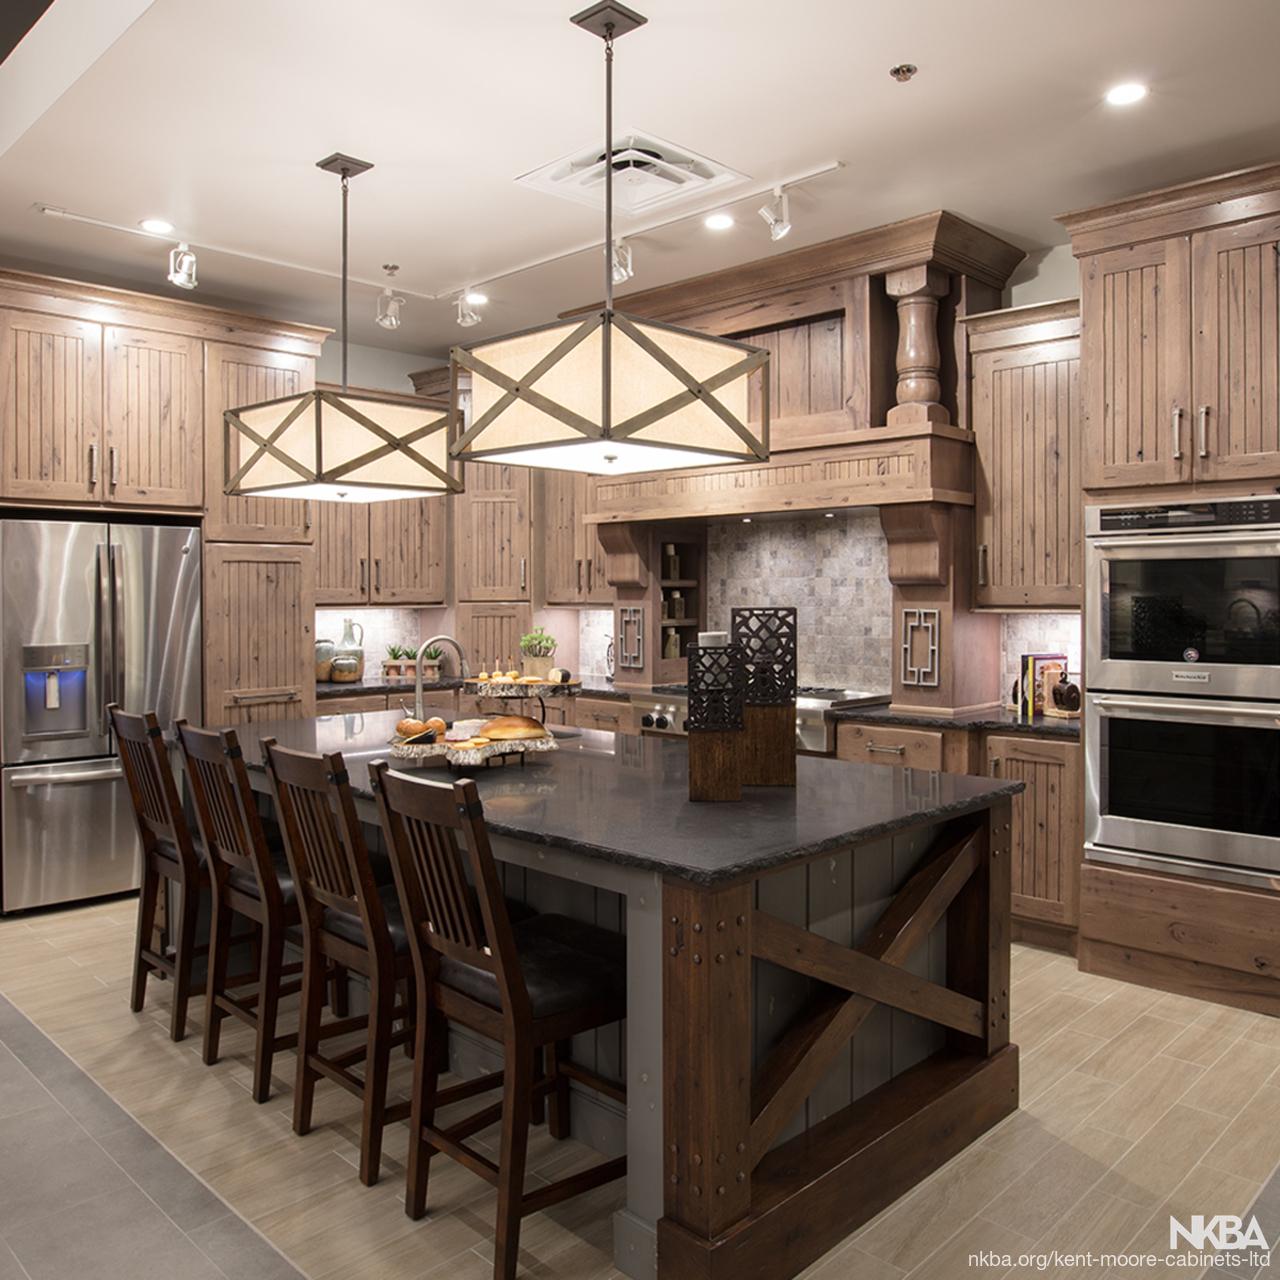 Rustic Kitchen Jobs: Rustic Renaissance Kitchen